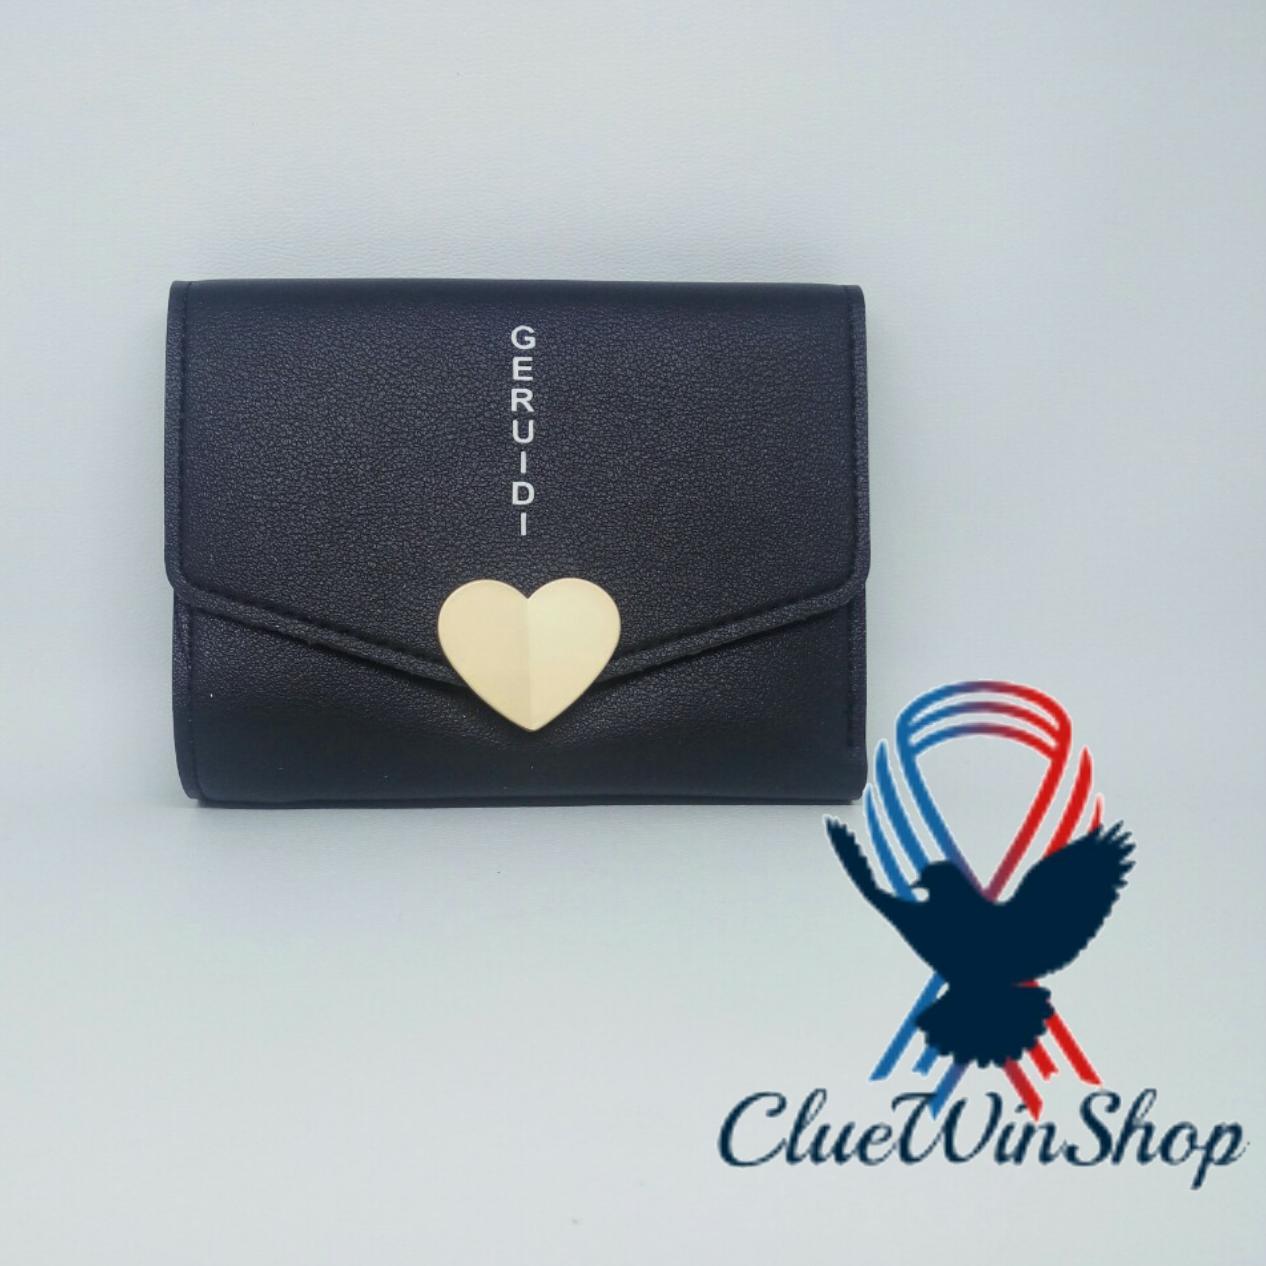 Dompet Lipat Wanita import murah terbaru- Clue Win Shop